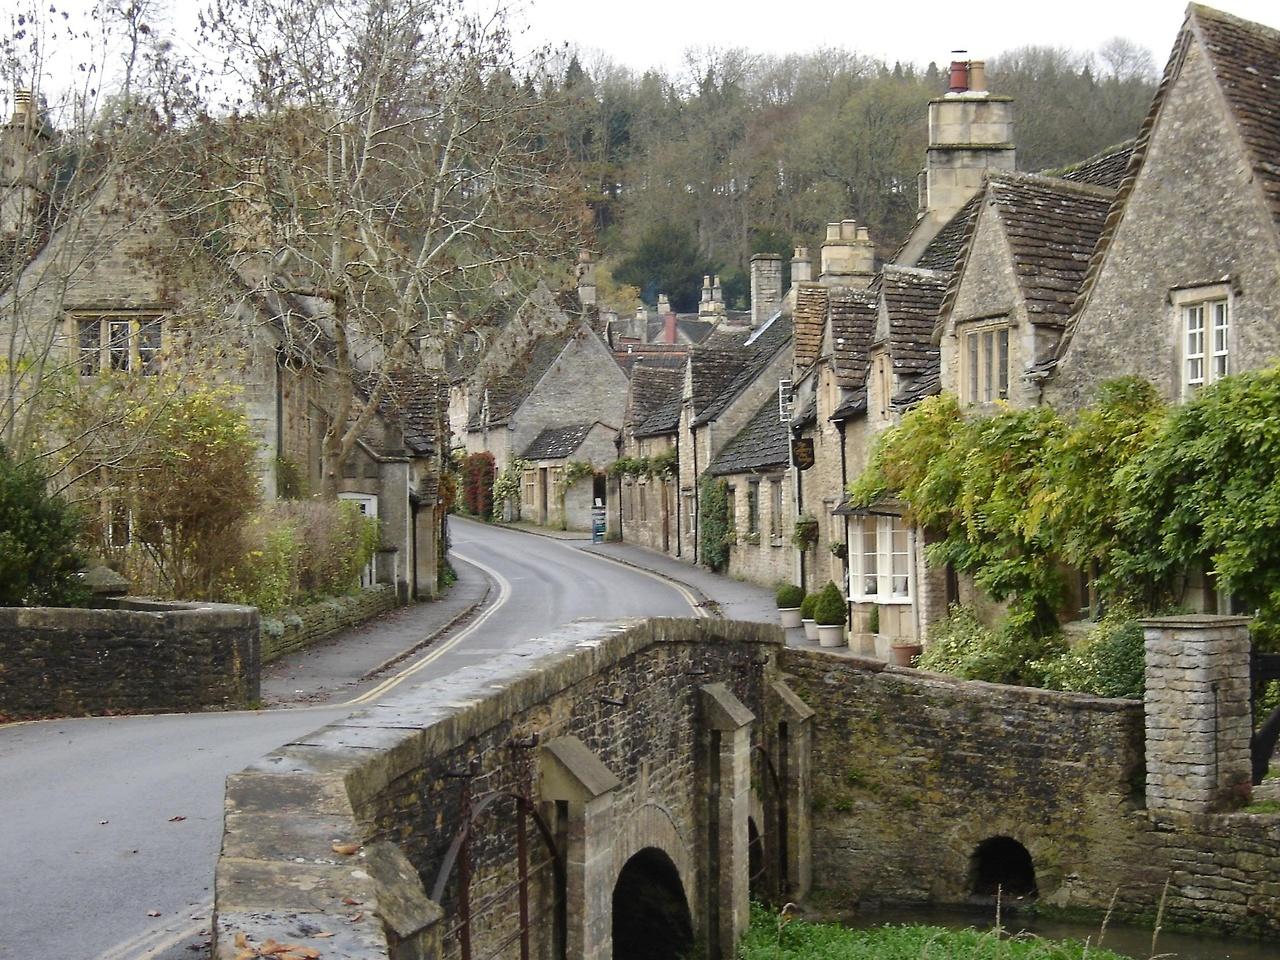 The Village of Bibury, England, с 1086 2